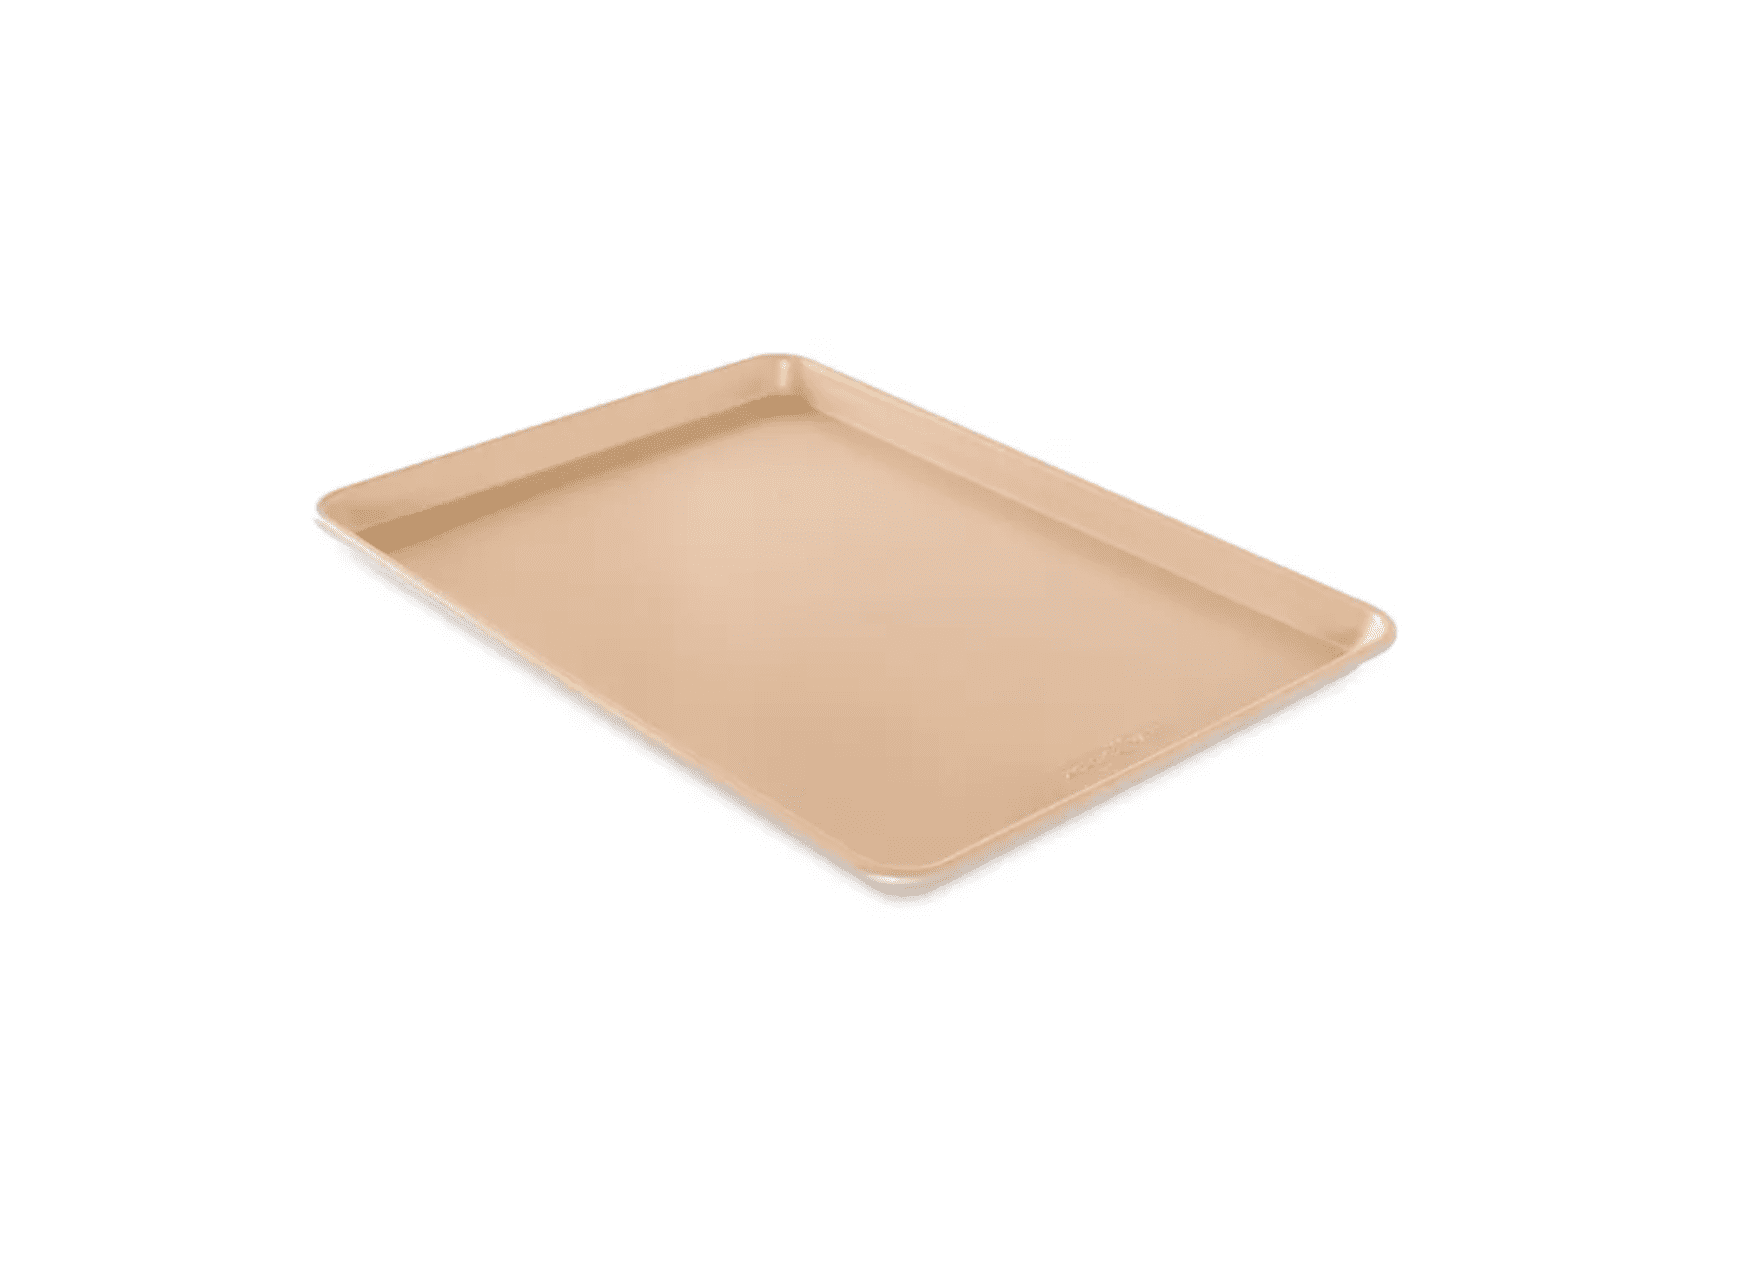 Nordic Ware Natural Alumnium Nonstick Baking Sheet